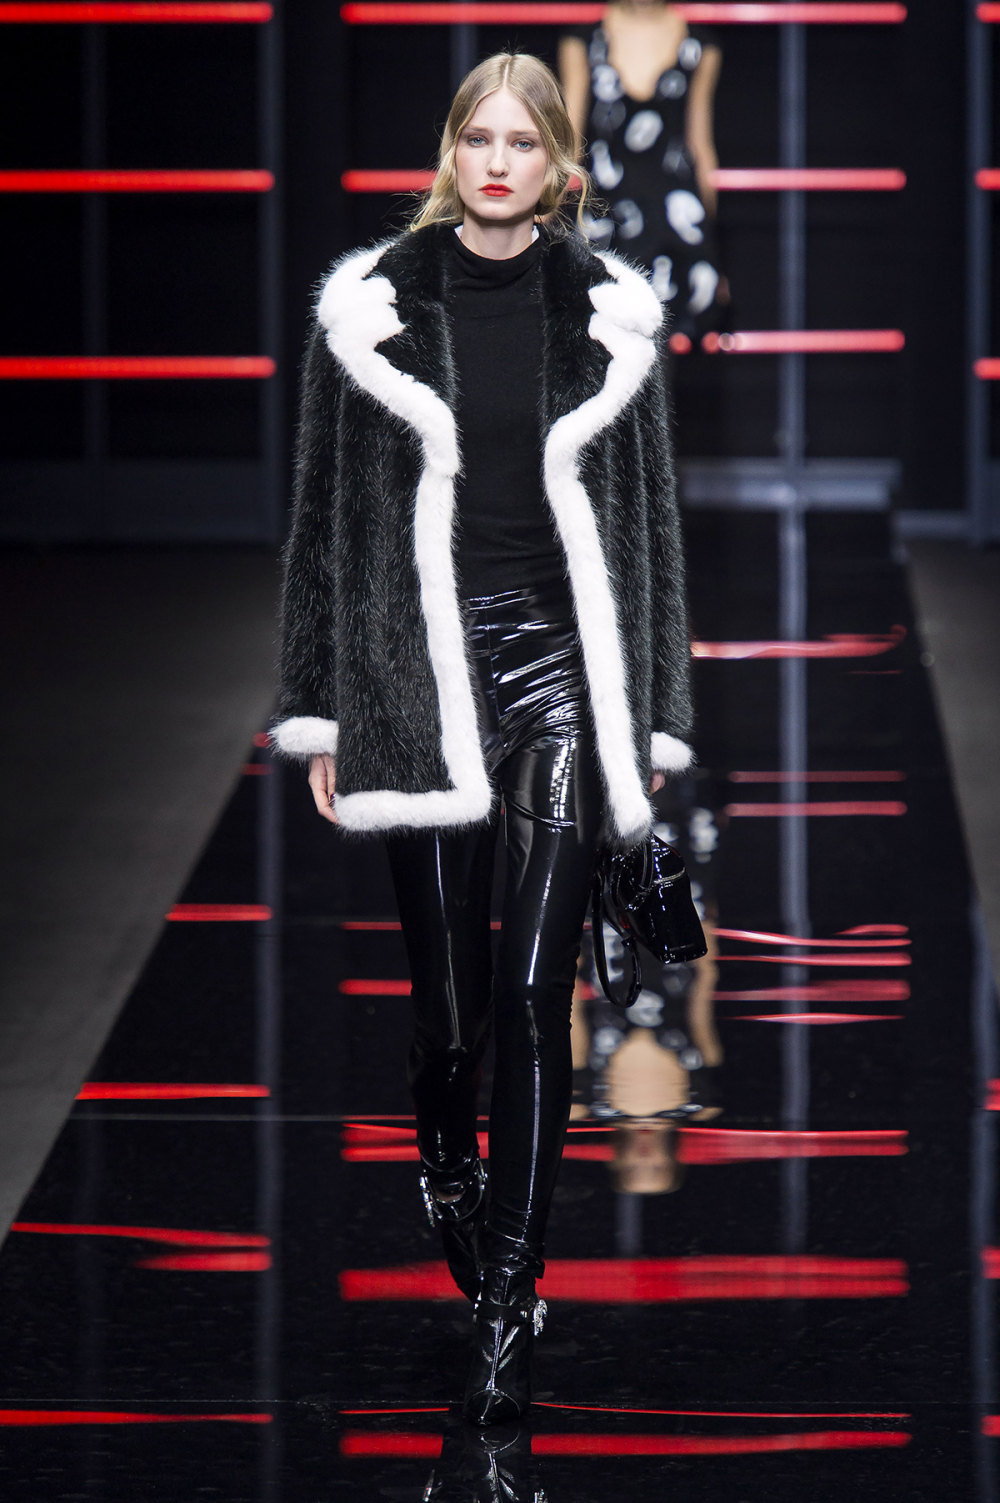 Emporio Armani时装系列畅的裤子带有柔滑裙子的鸡尾酒礼服-21.jpg